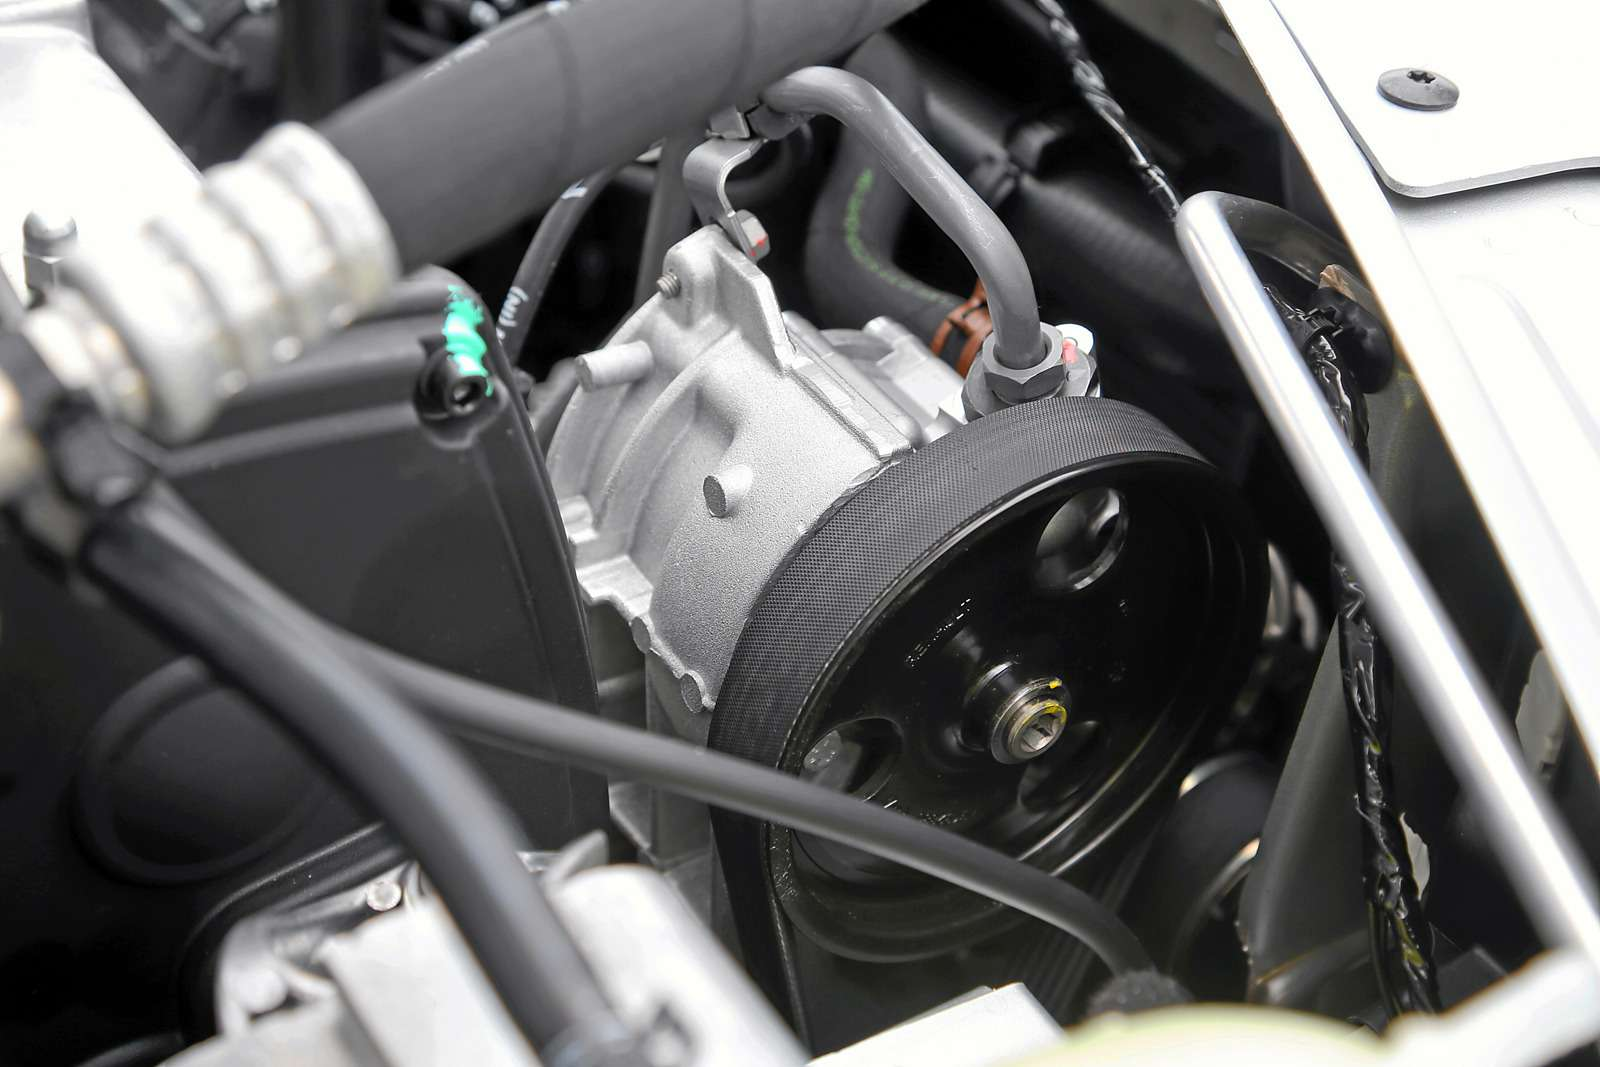 Lada Largus сдвигателем ВАЗ-11189: плюс три силы зарубли— фото 605454